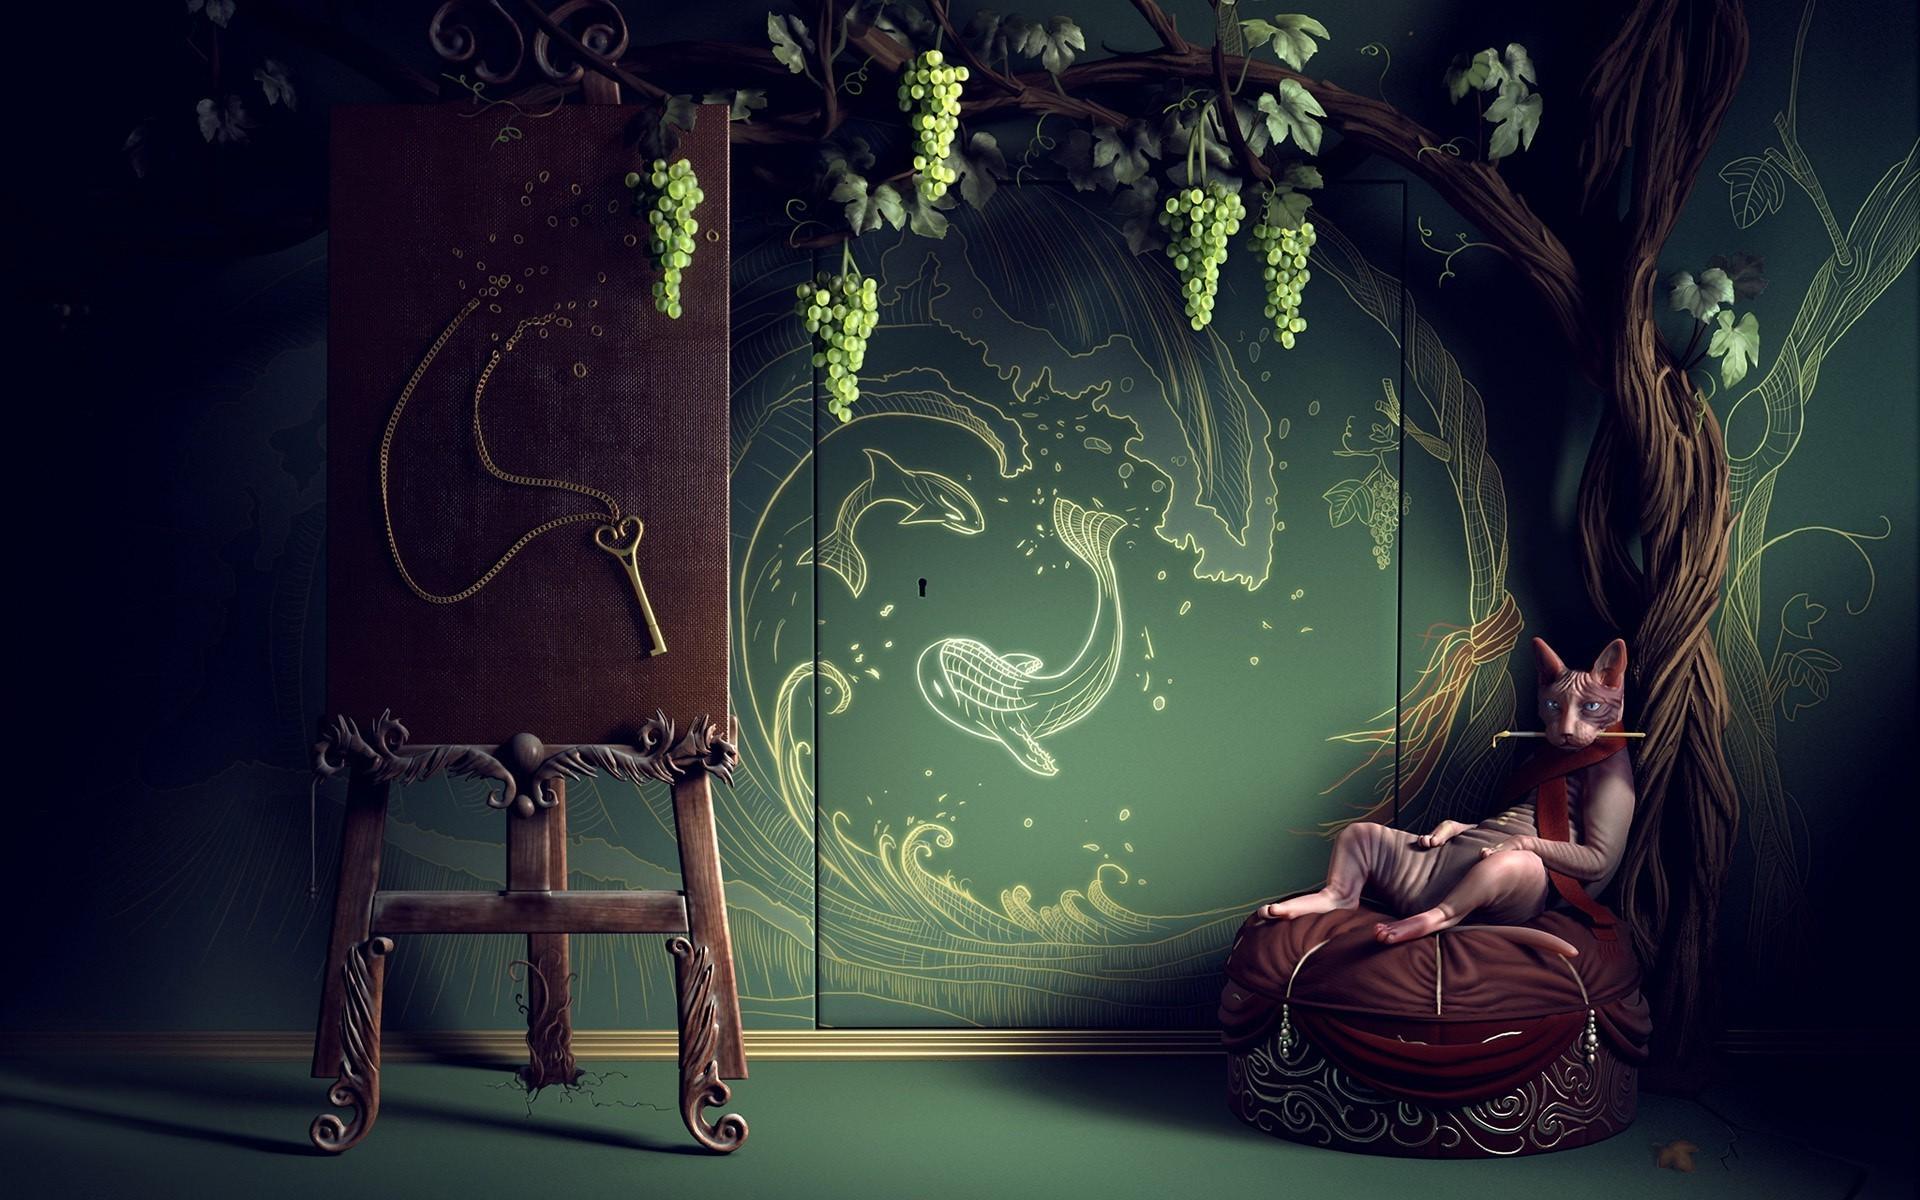 Hamsa Iphone Wallpaper Bohemian Backgrounds 183 ①